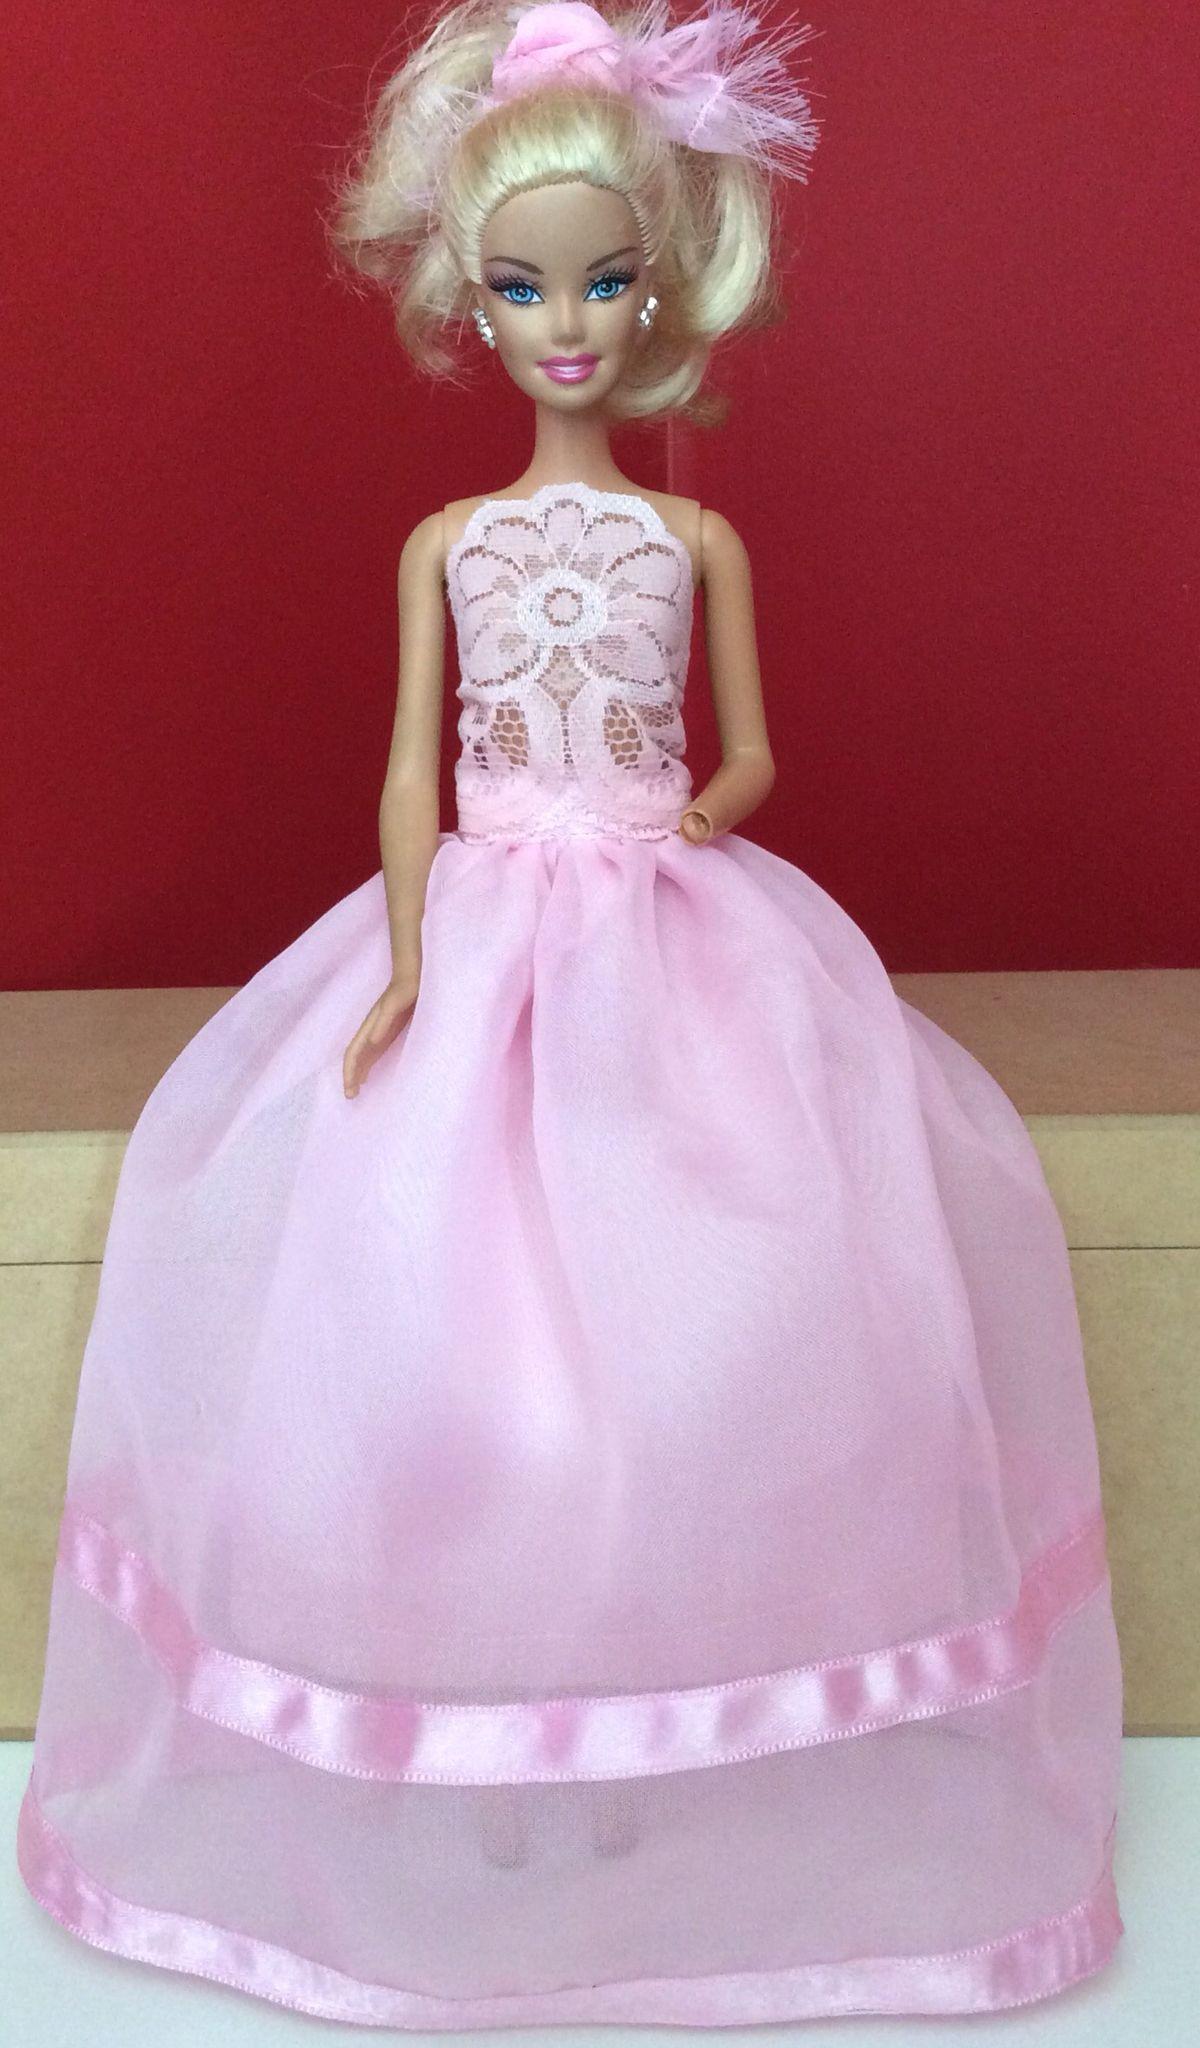 Vestido rosa com renda